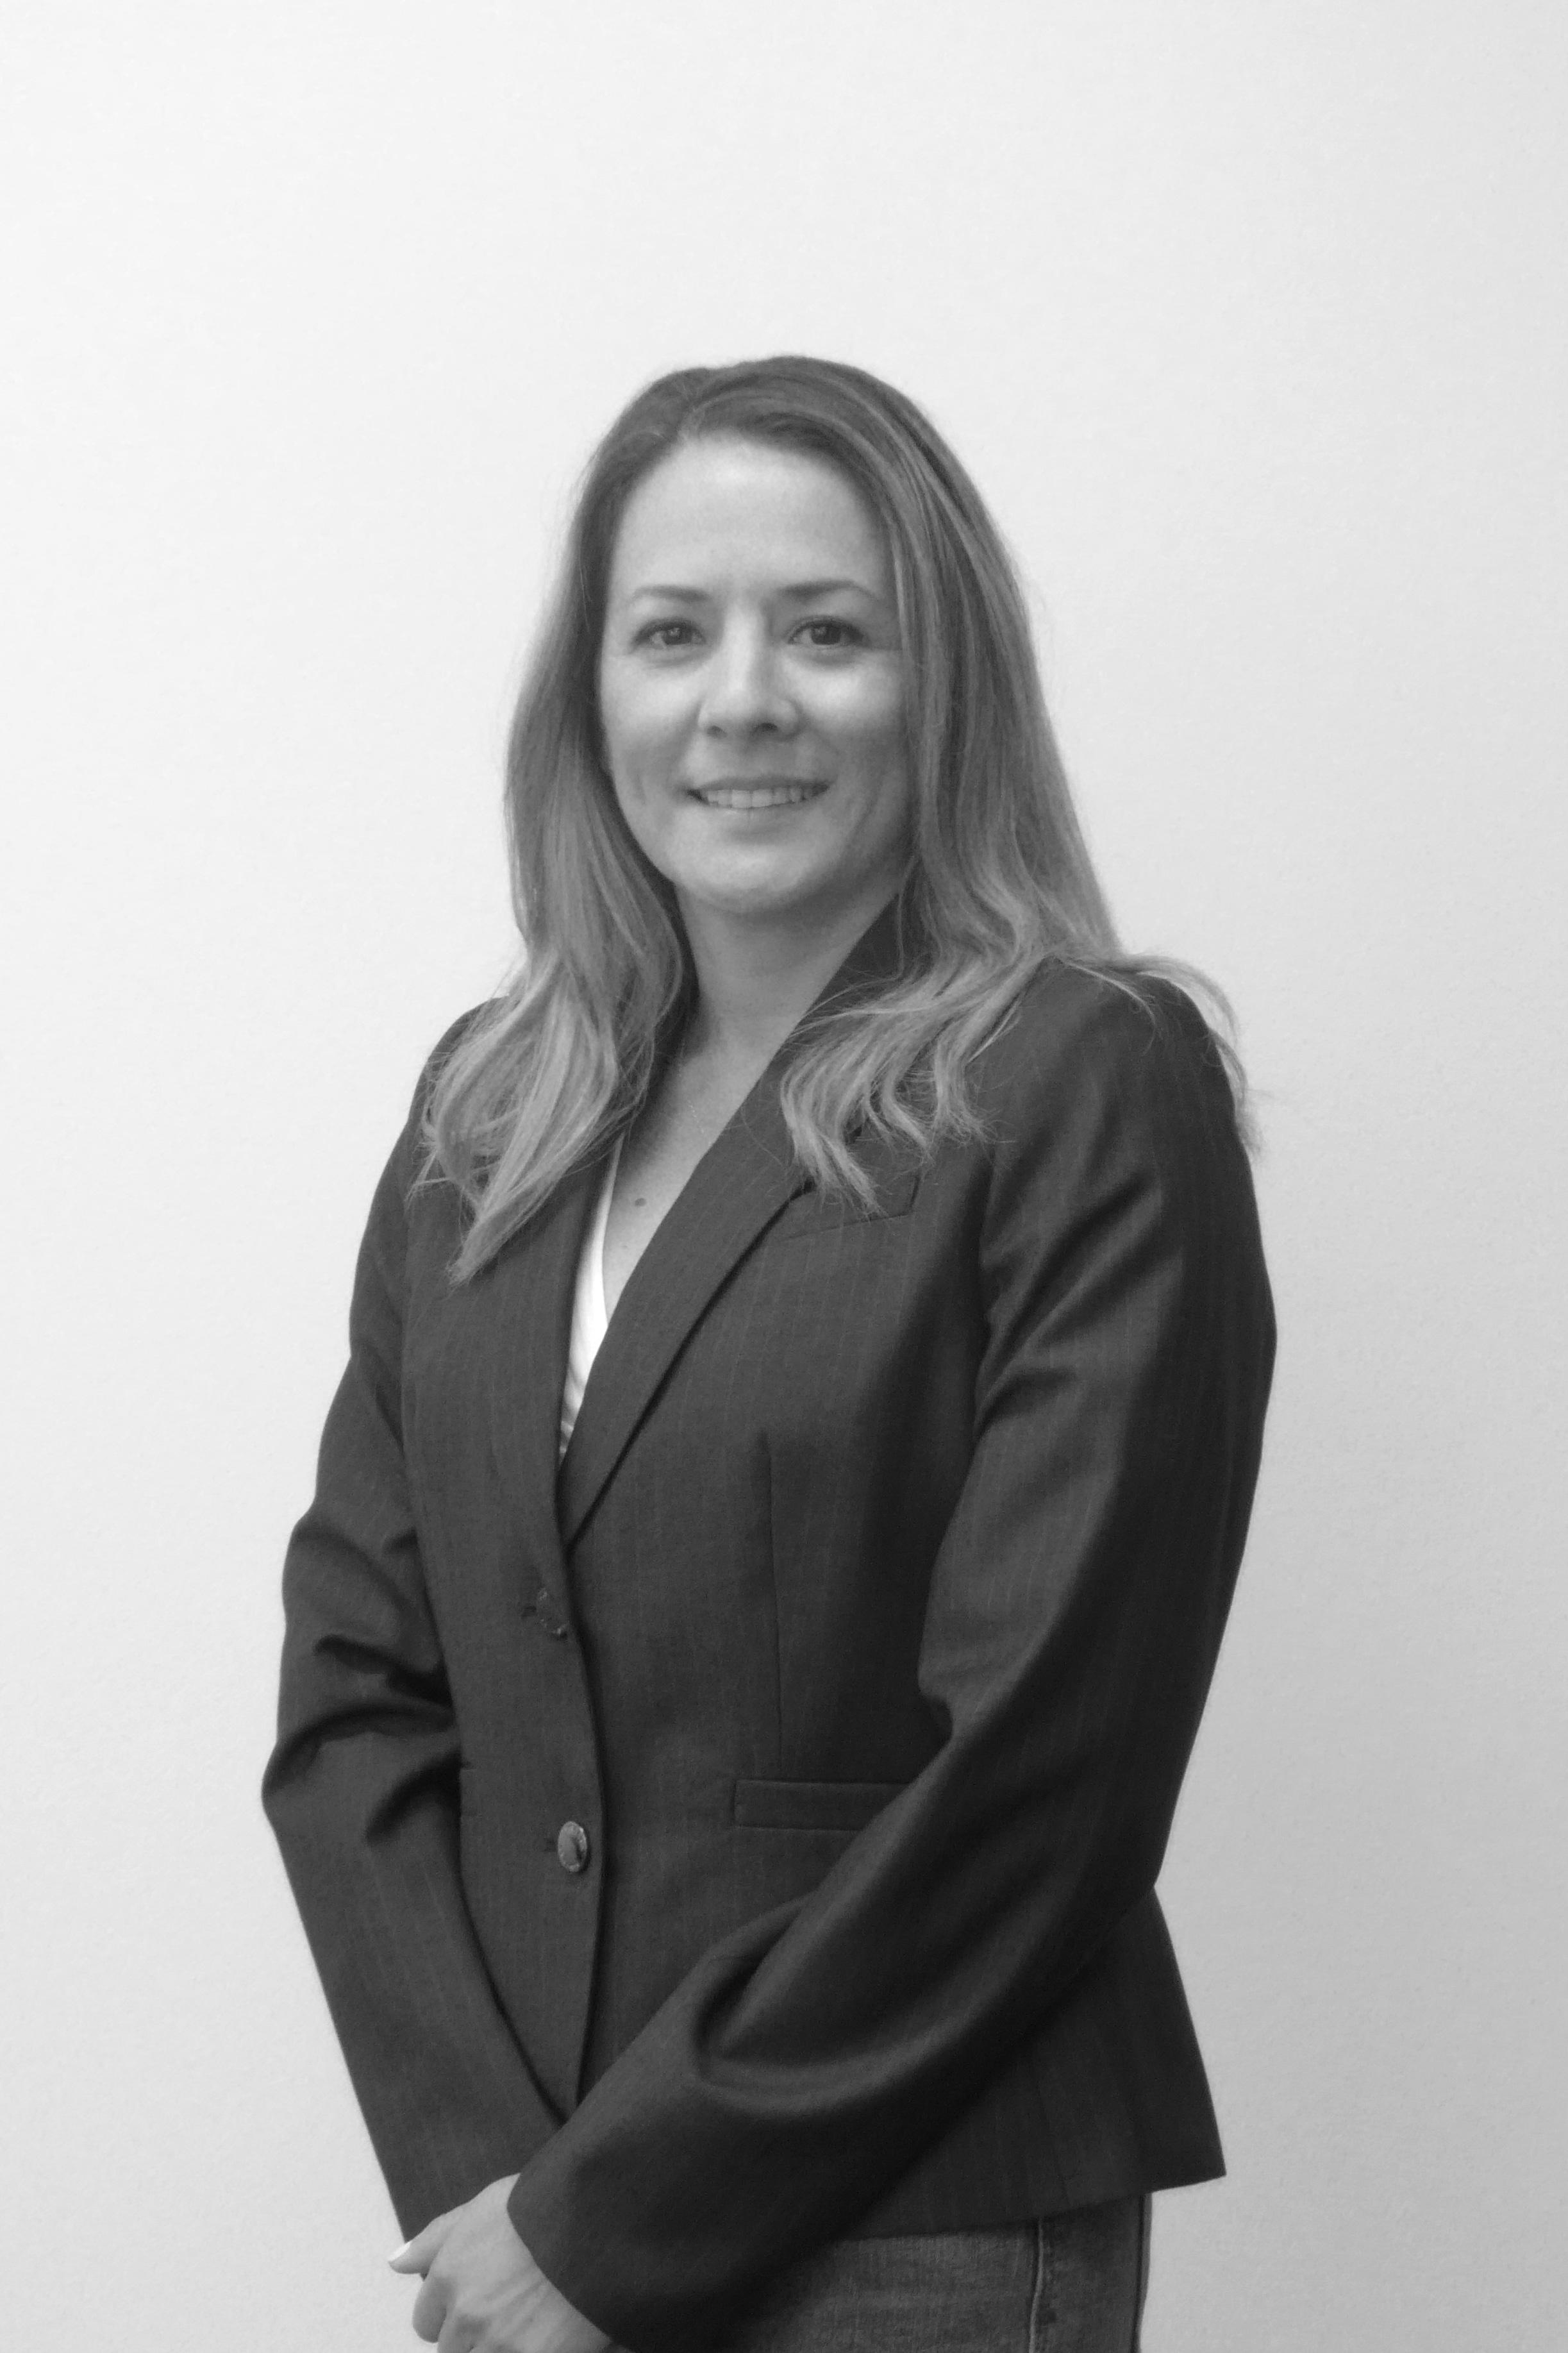 Paola Coria